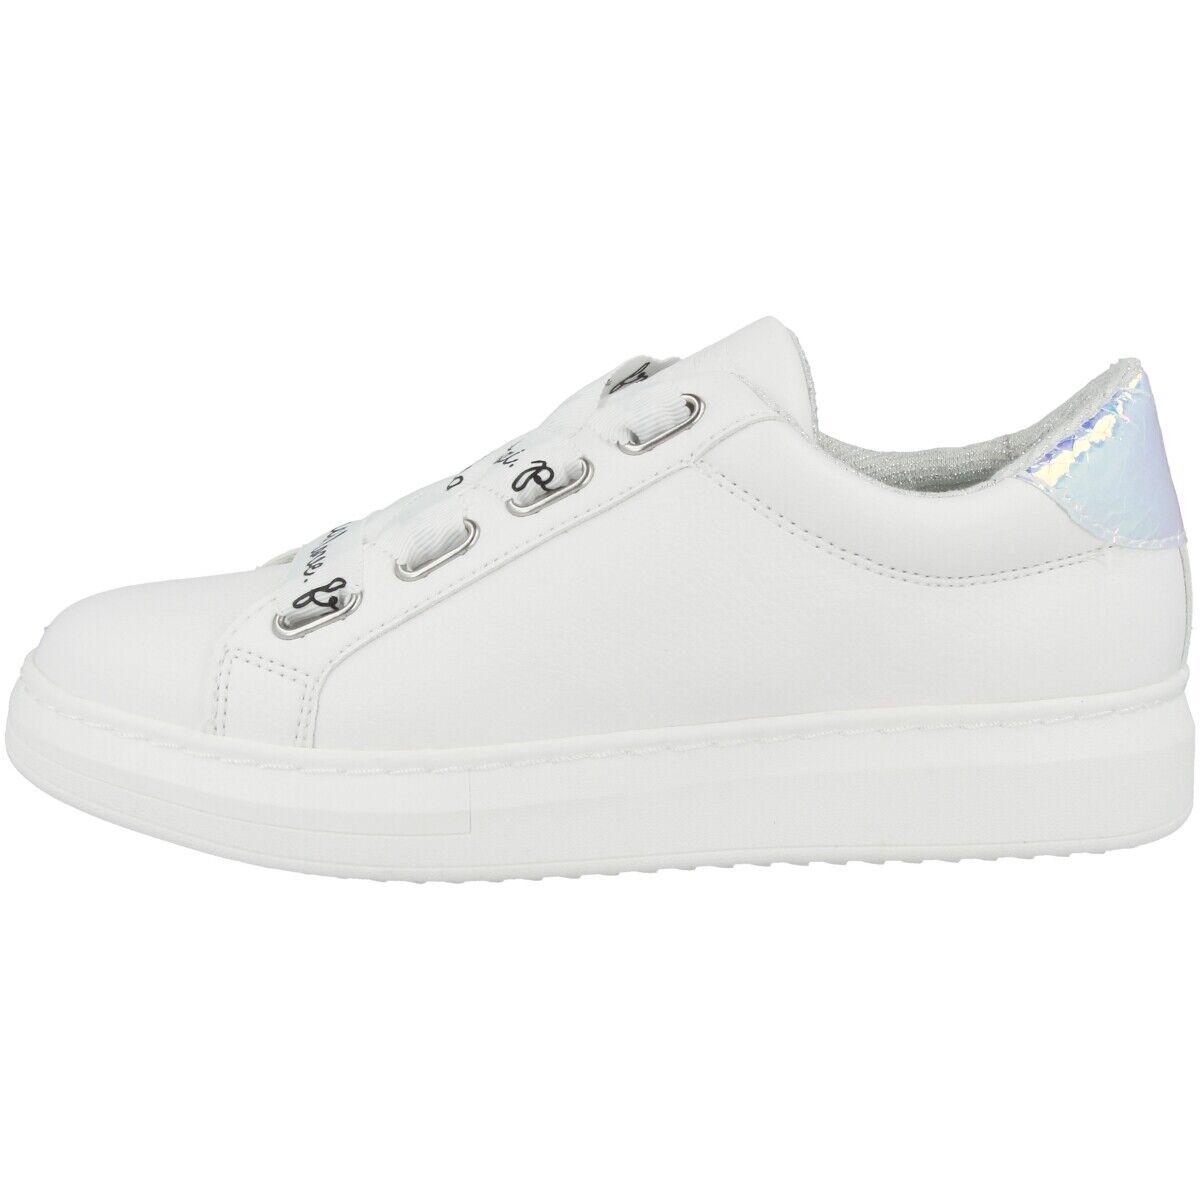 15df43bfe93c Fritzi aus preußen stretcher shoes women women women low cut sneakers 3eff2a